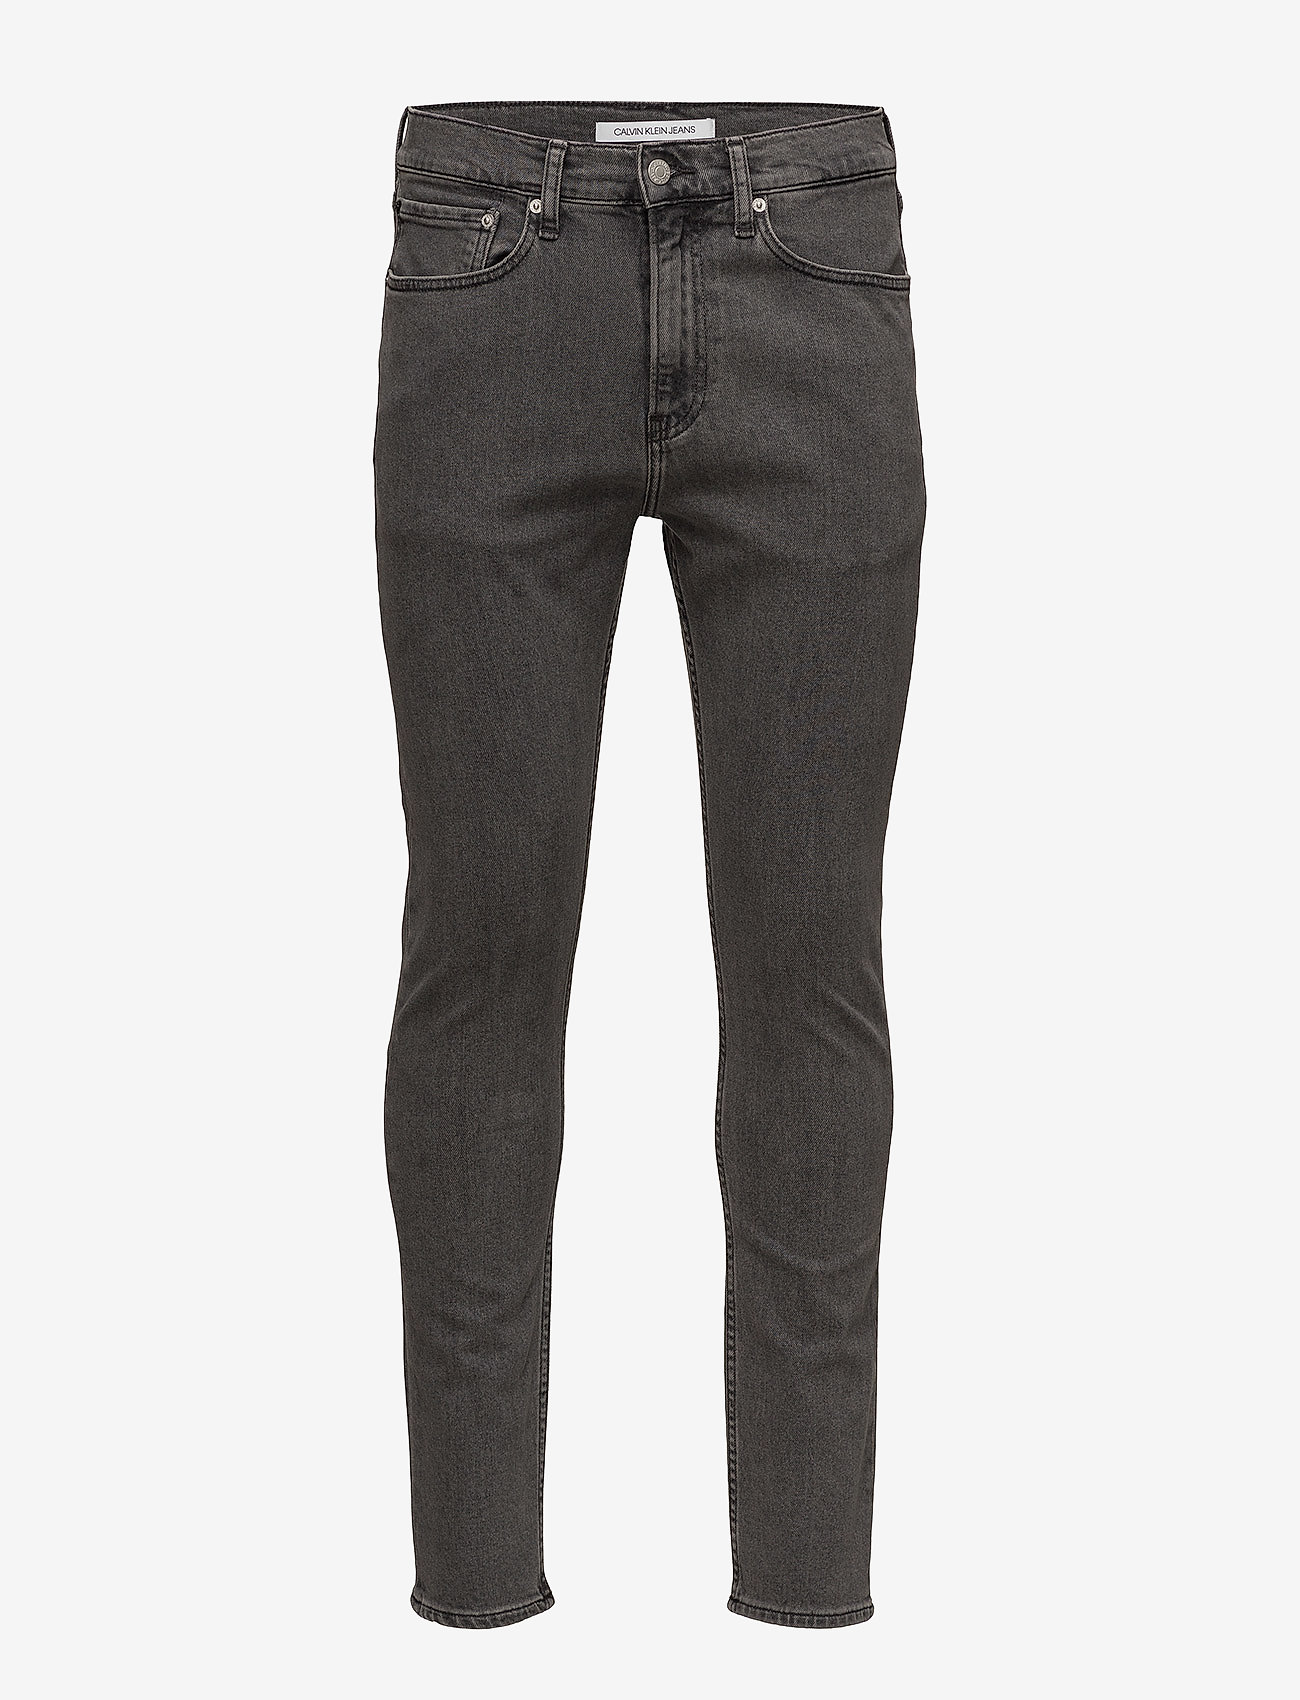 Calvin Klein Jeans - CKJ 016 SKINNY - skinny jeans - copenhagen grey